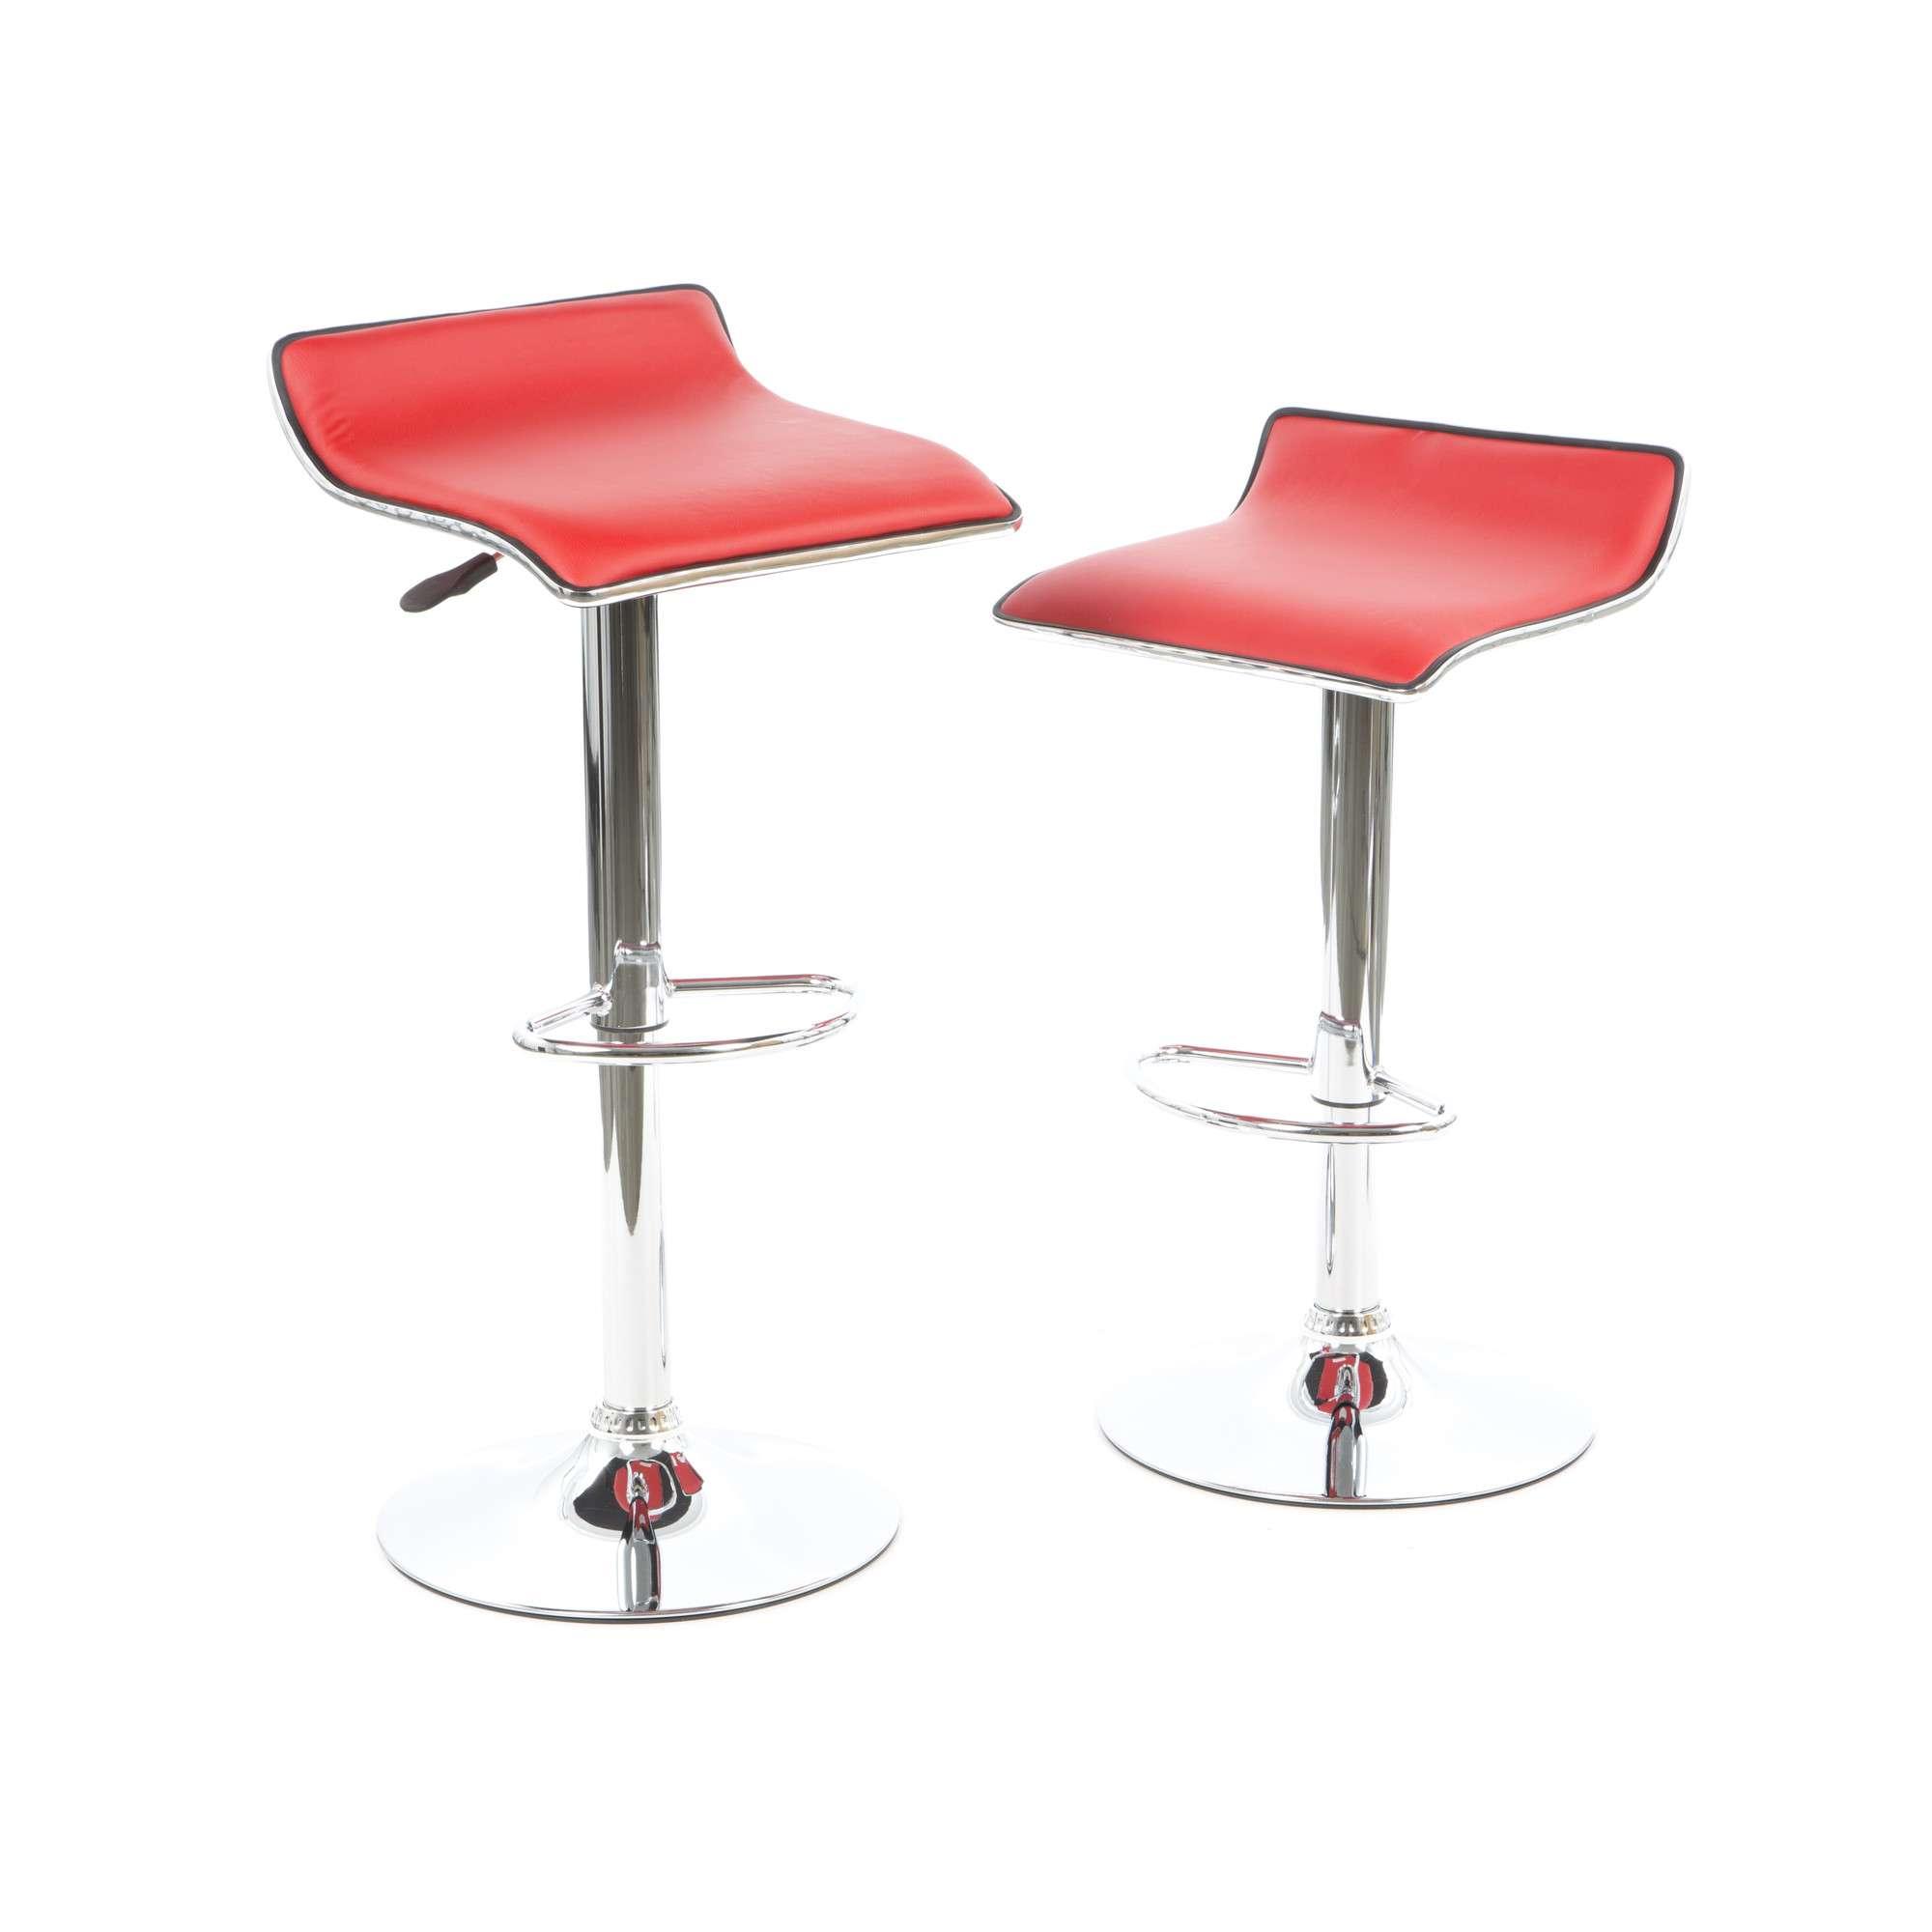 set sillas banco para cocina barra powell rojo cromado vv en mercado libre with sillas de barra de cocina